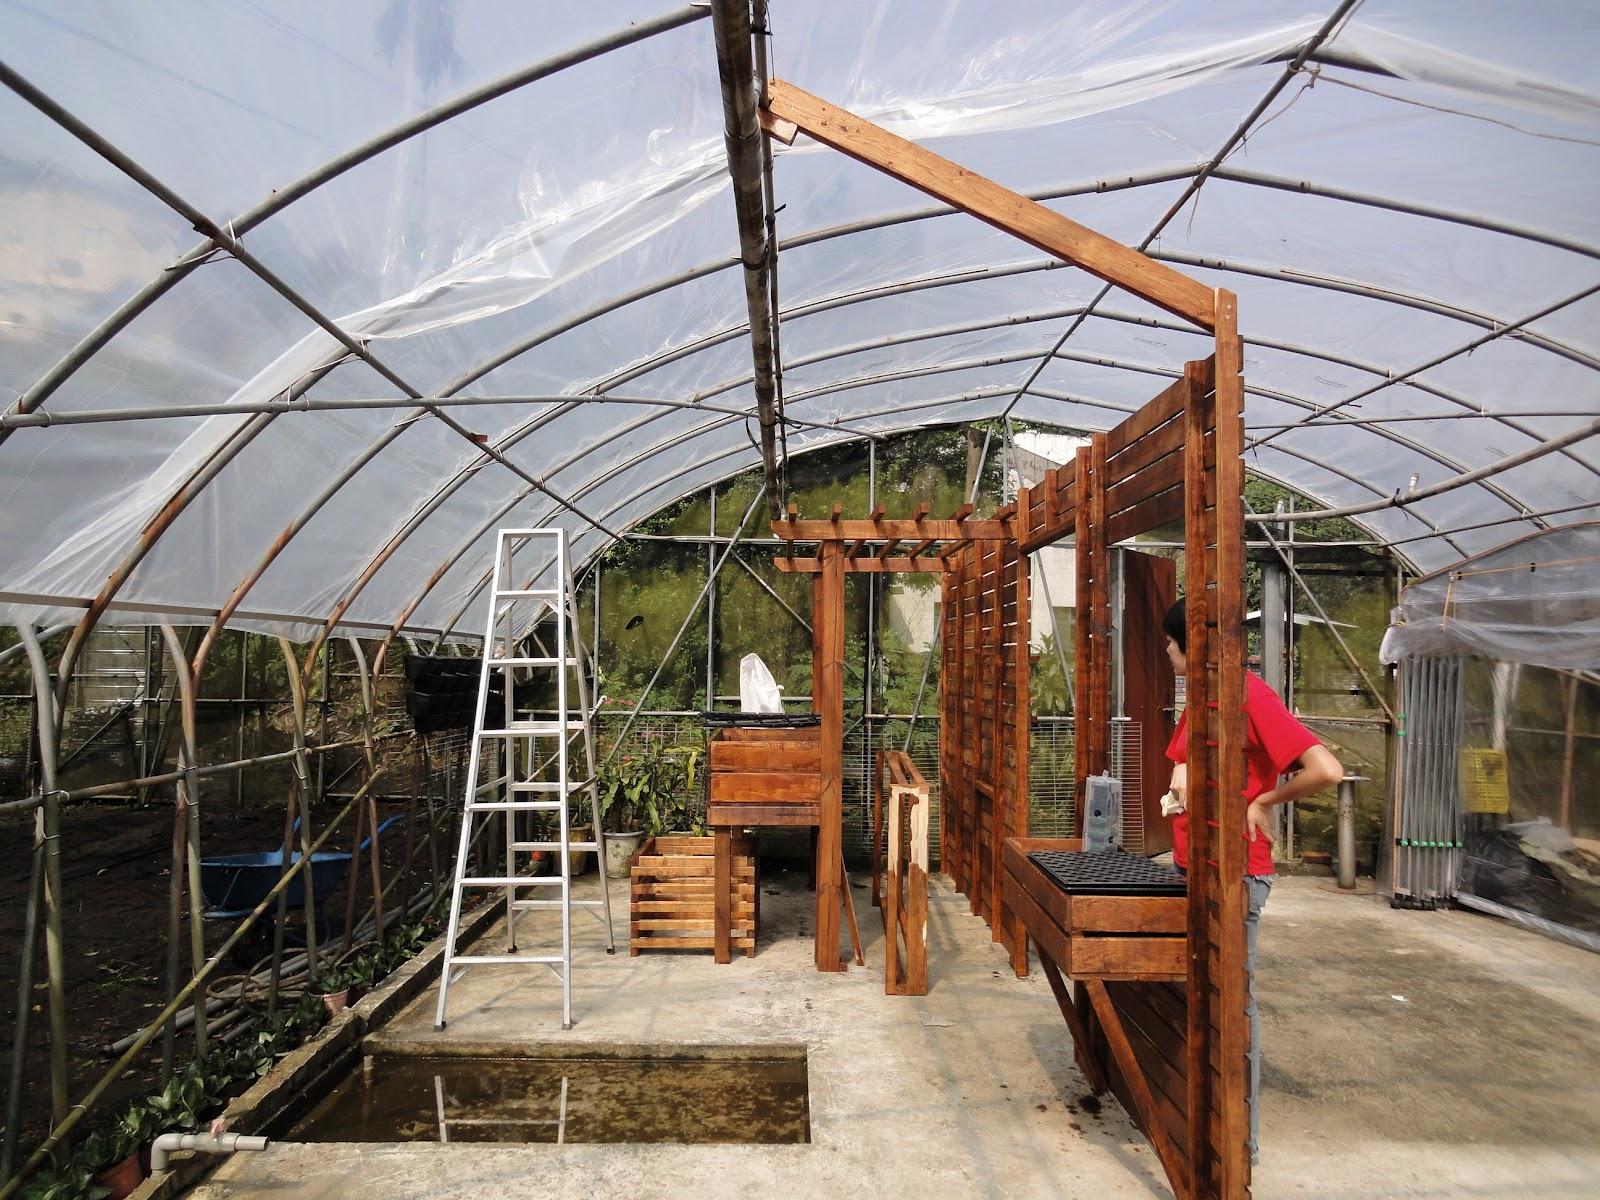 AVATA魚菜共生/Aquaponics Taiwan: 屈尺農場(三) My AP farm in Taiwan 3